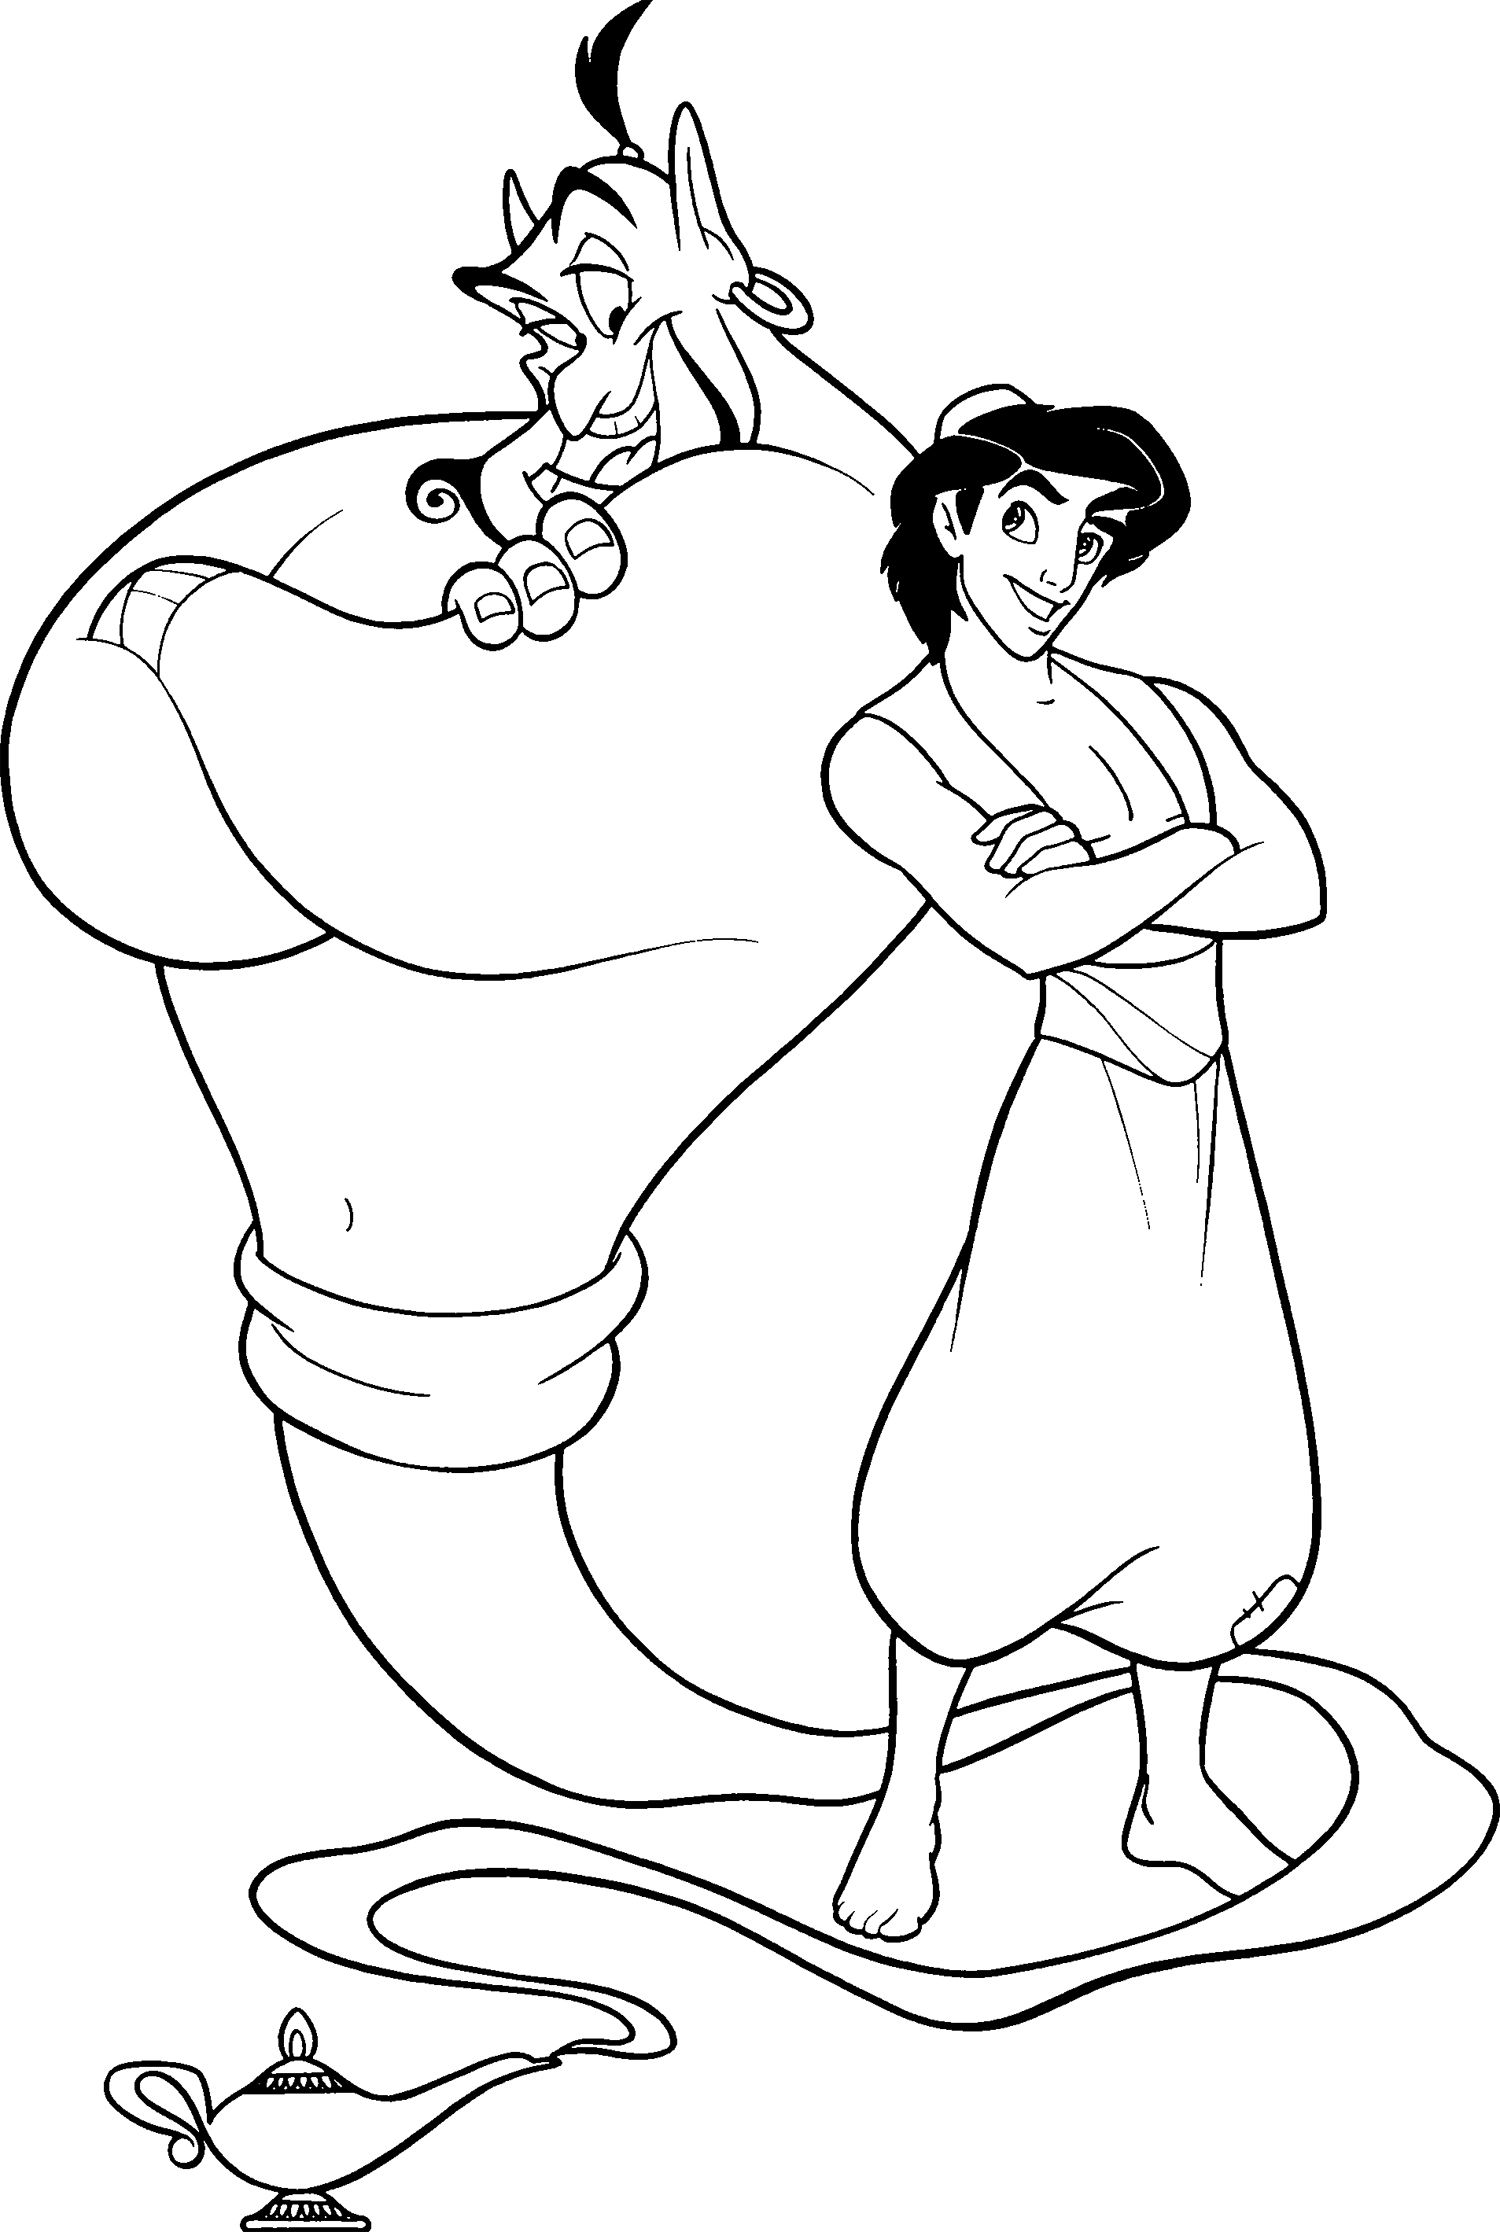 Aladdin  Disney coloring sheets, Cartoon coloring pages, Princess